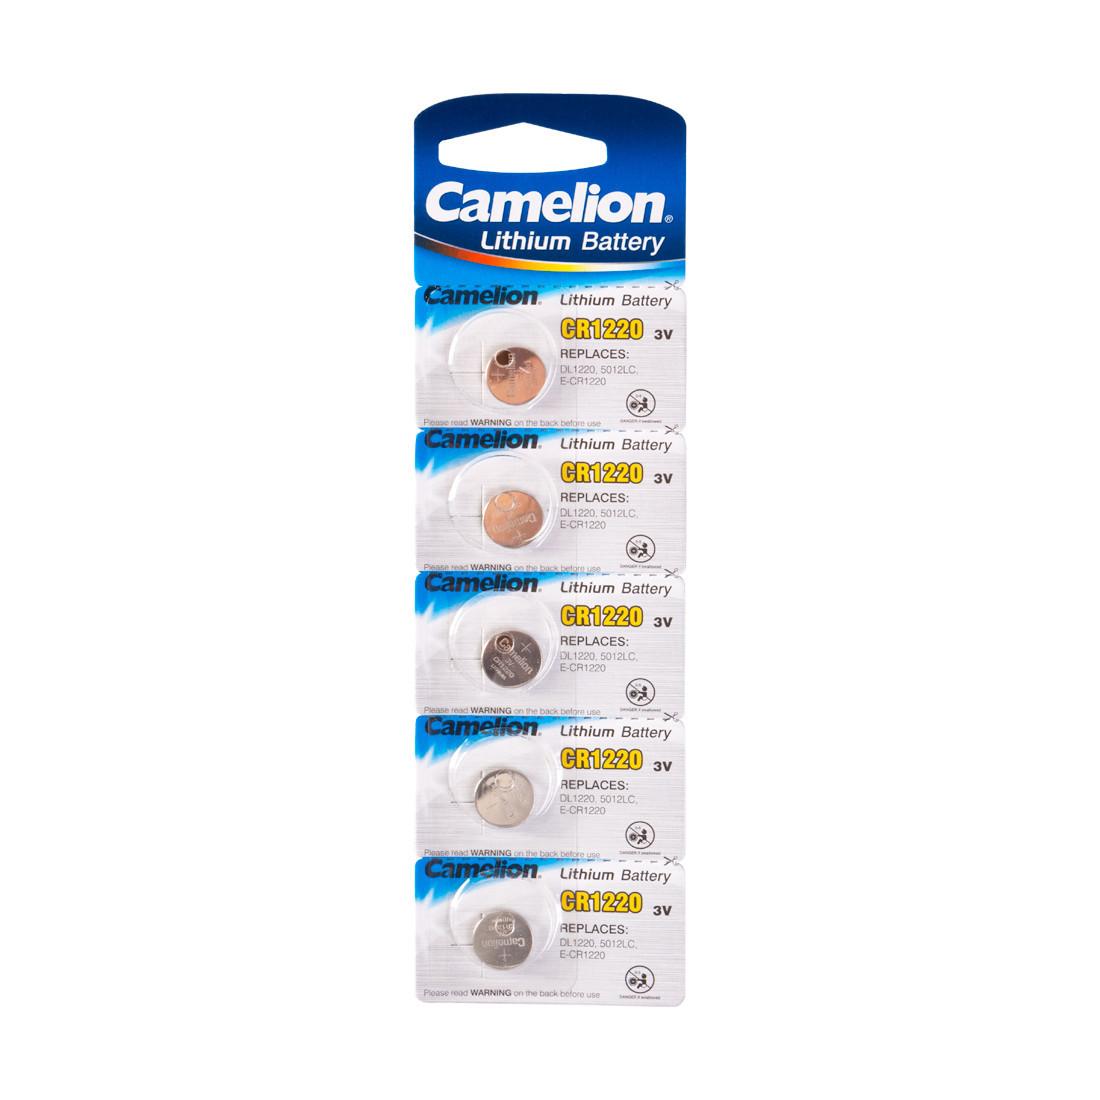 Батарейка Camelion CR1220-BP5 3 В, Упакова: Блистер 1 шт., Аналоги: CR1616\5021LC, Тип батареи: Литий-ионный